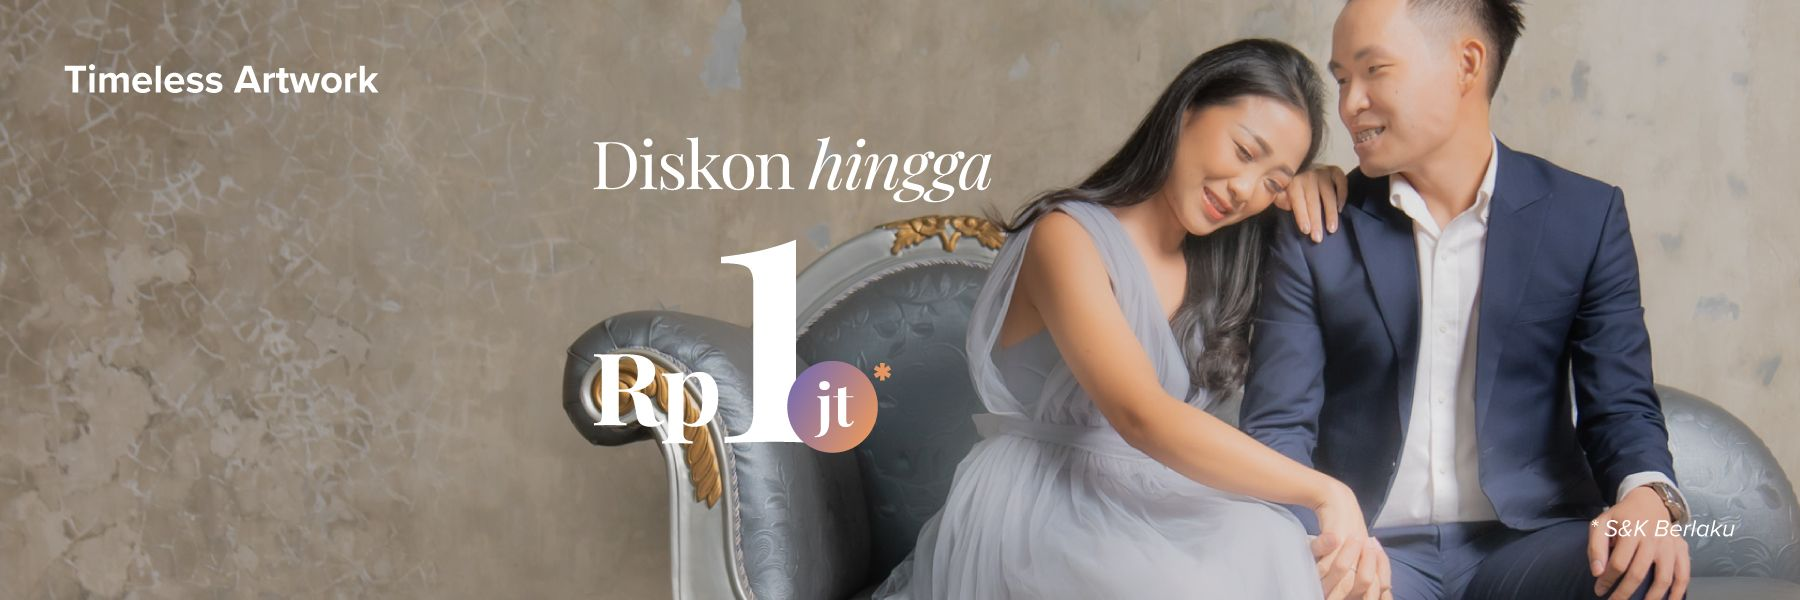 Diskon Rp 1,000,000 di Timeless Artwork